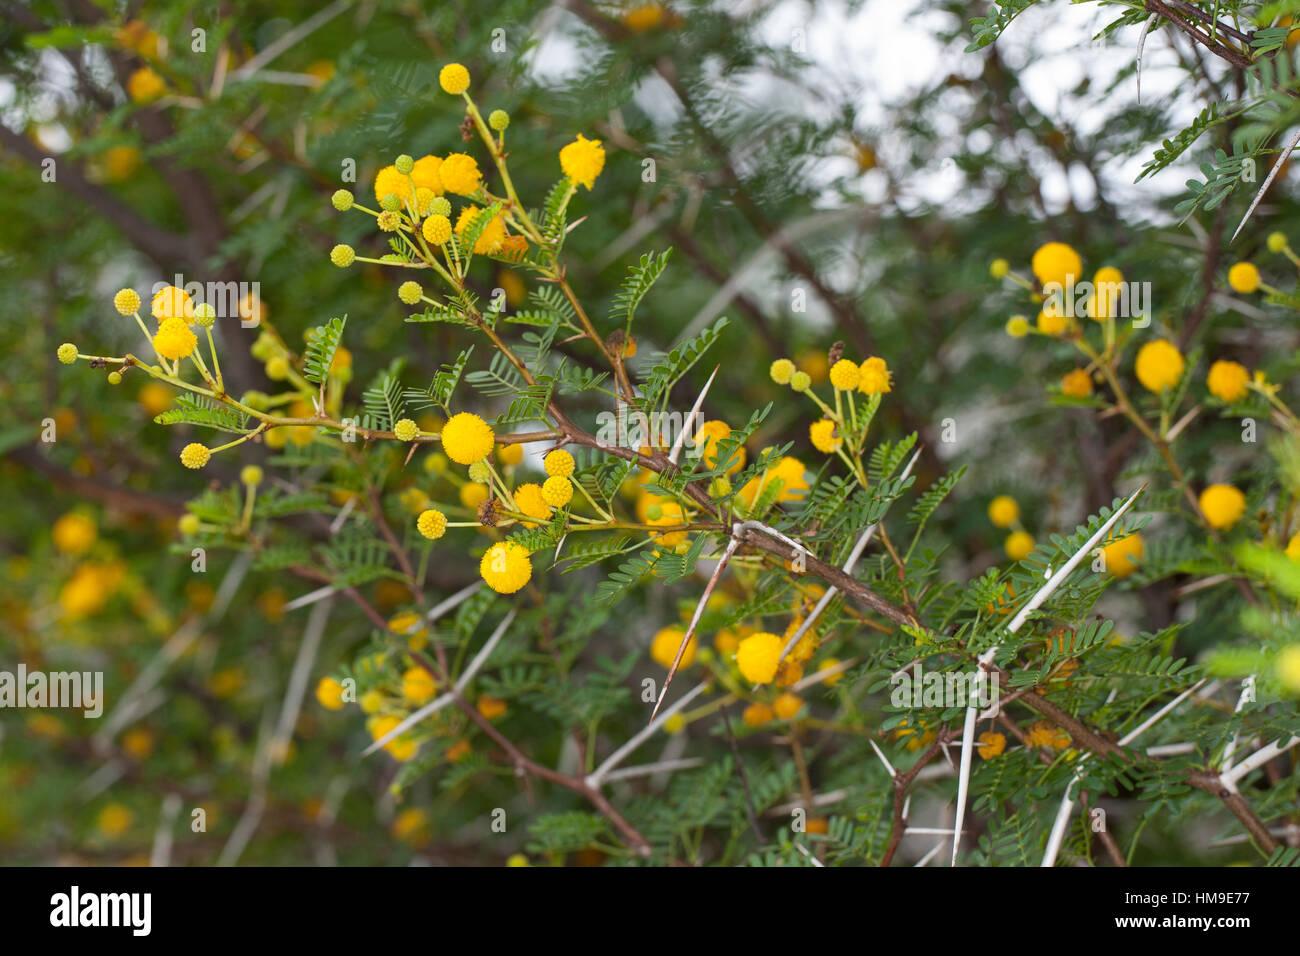 Schreckliche Akazie Dornen Dorn Acacia Karroo Acacia Karoo Stock